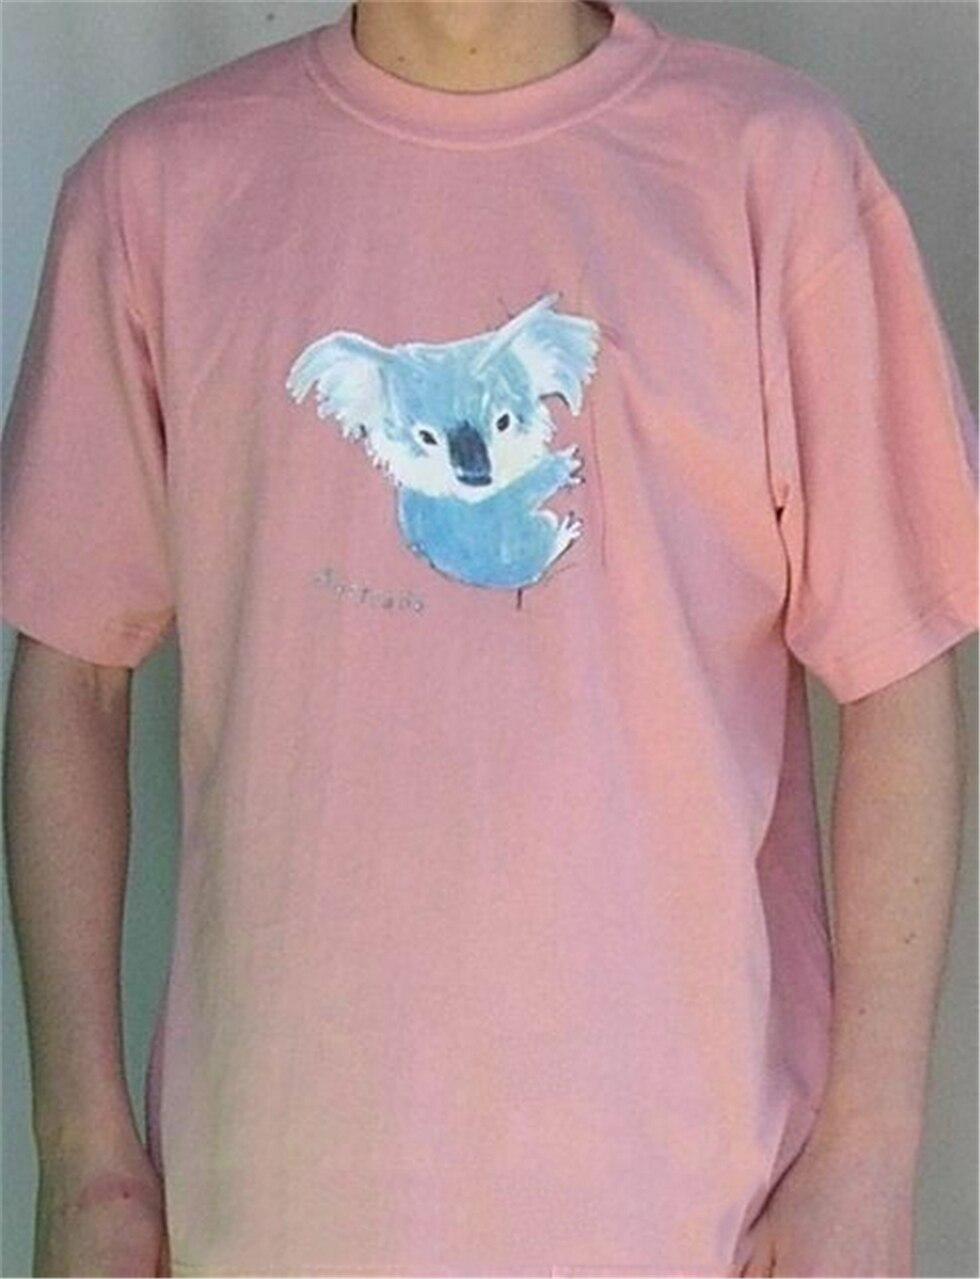 Camiseta Koala Arty (Rosa polvoriento)-Camiseta de Animal nativo australiano-¡envío gratis! Camiseta divertida Harajuku